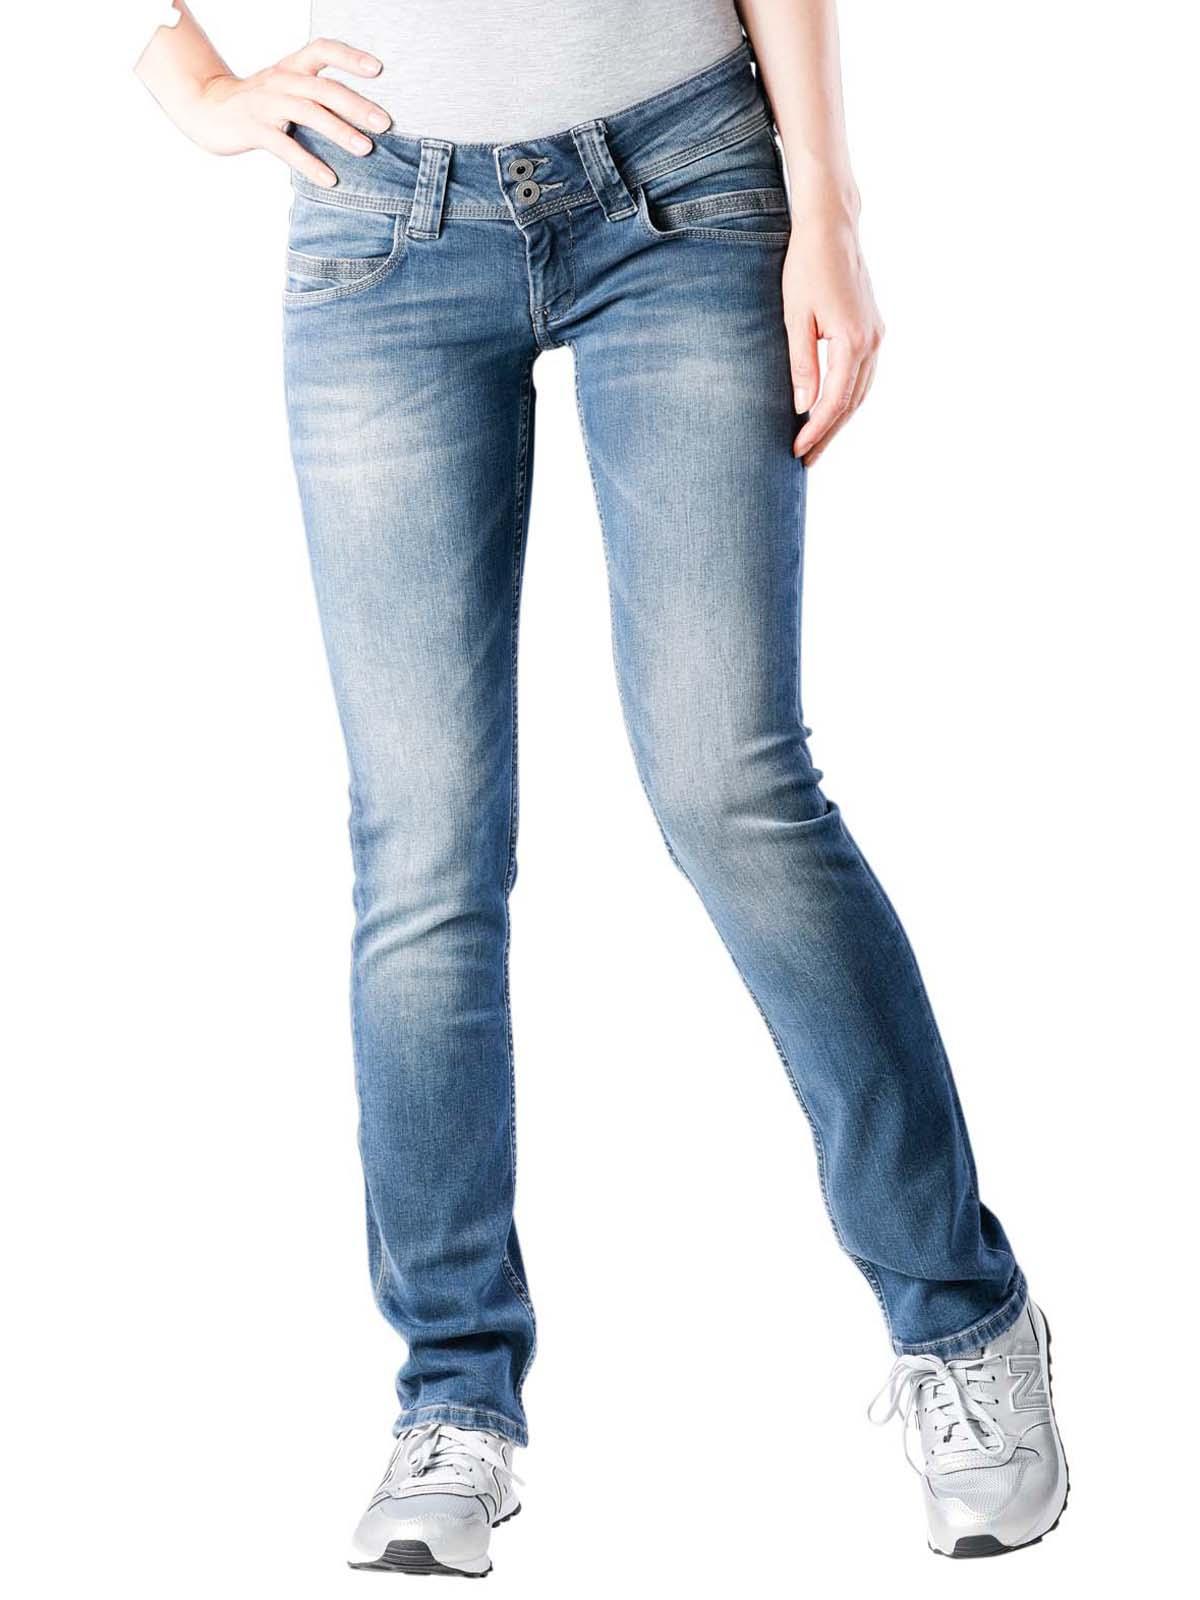 Pepe Jeans Venus Straight WE6 W26L32